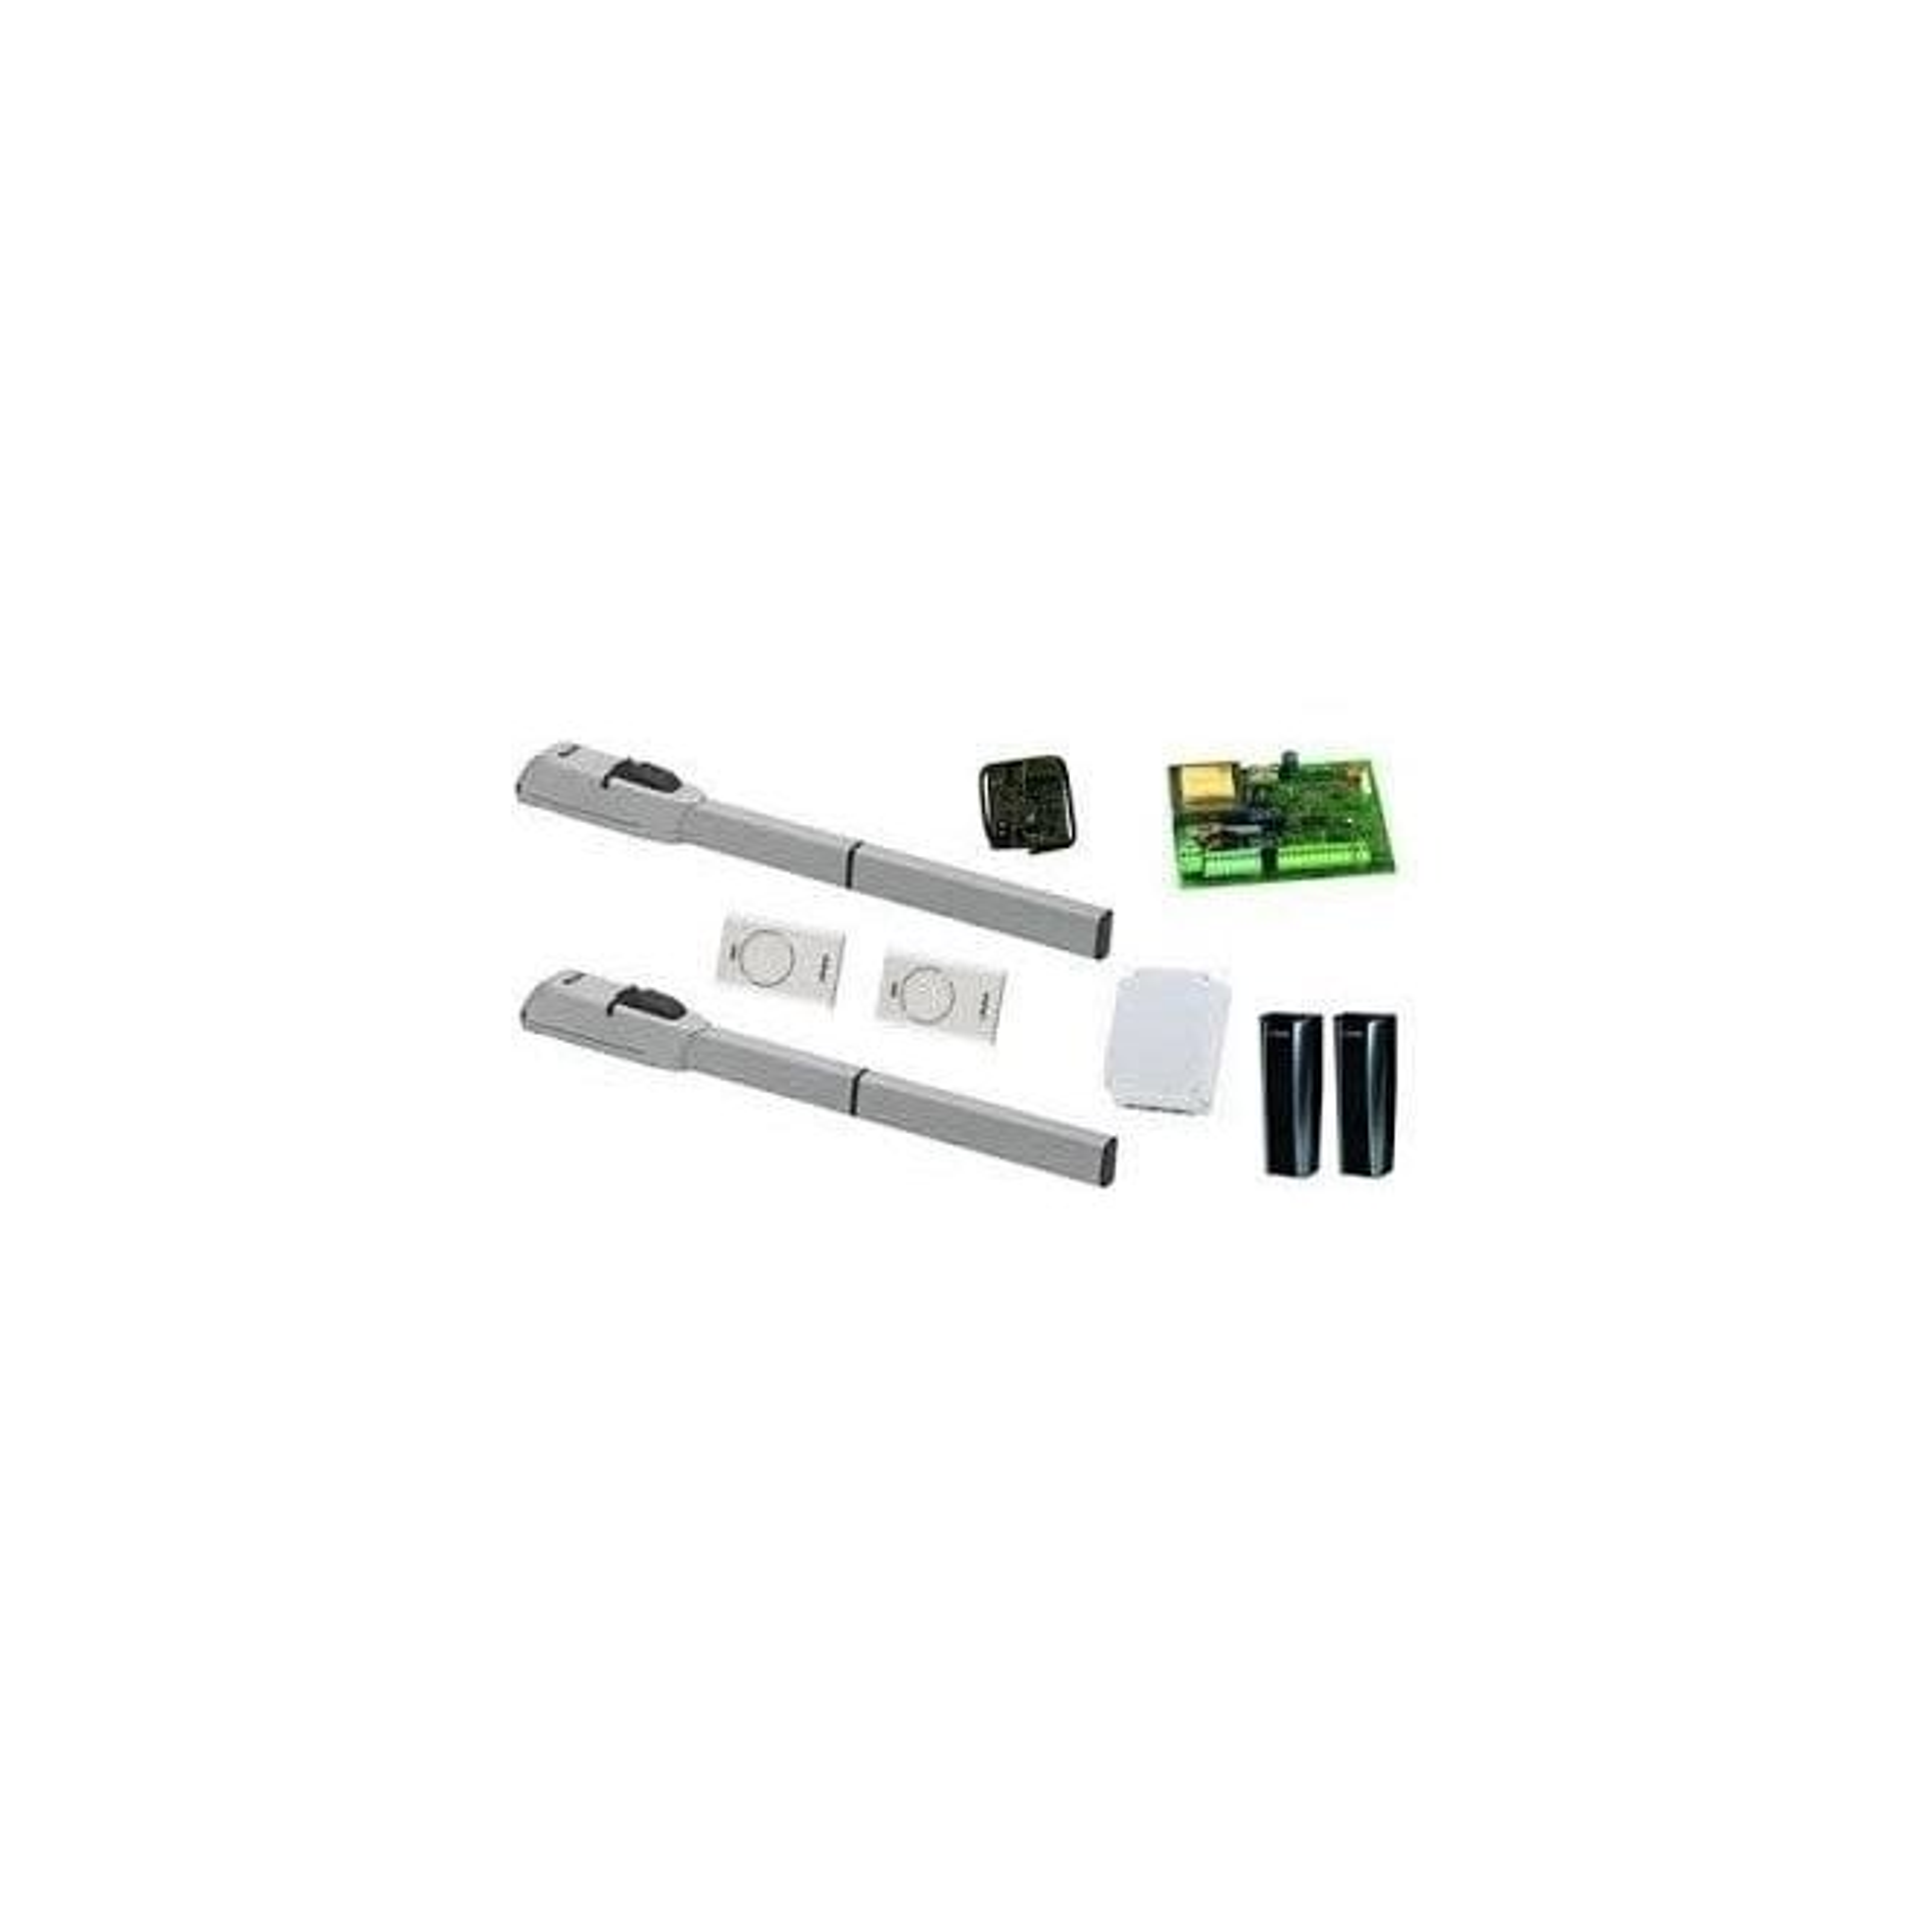 FAAC 415 24V KIT electro mechanical operator double kit for swing gates